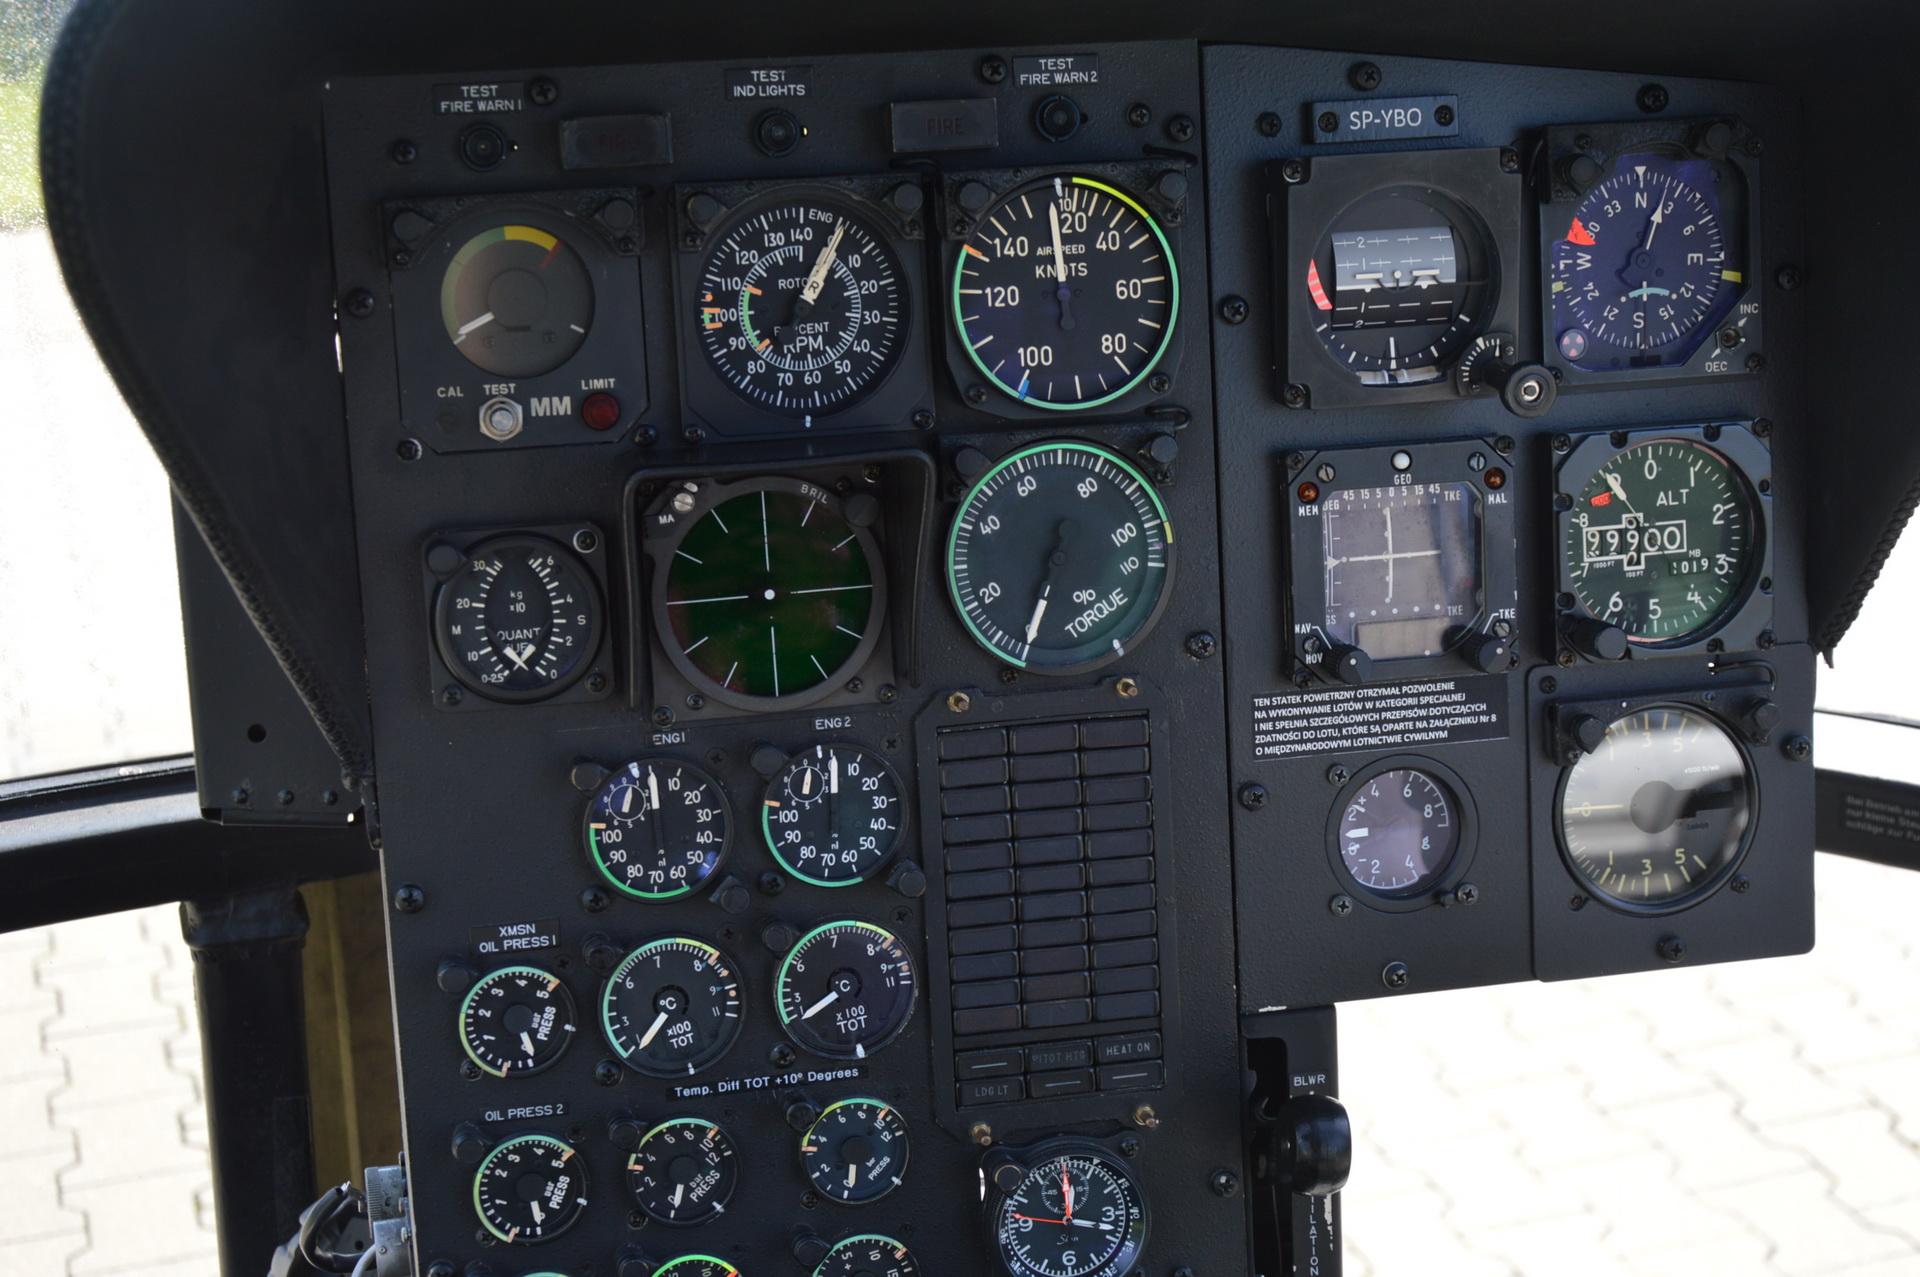 bolkow-bo105-sp-ybo-for-sale-plane4you-258.jpg